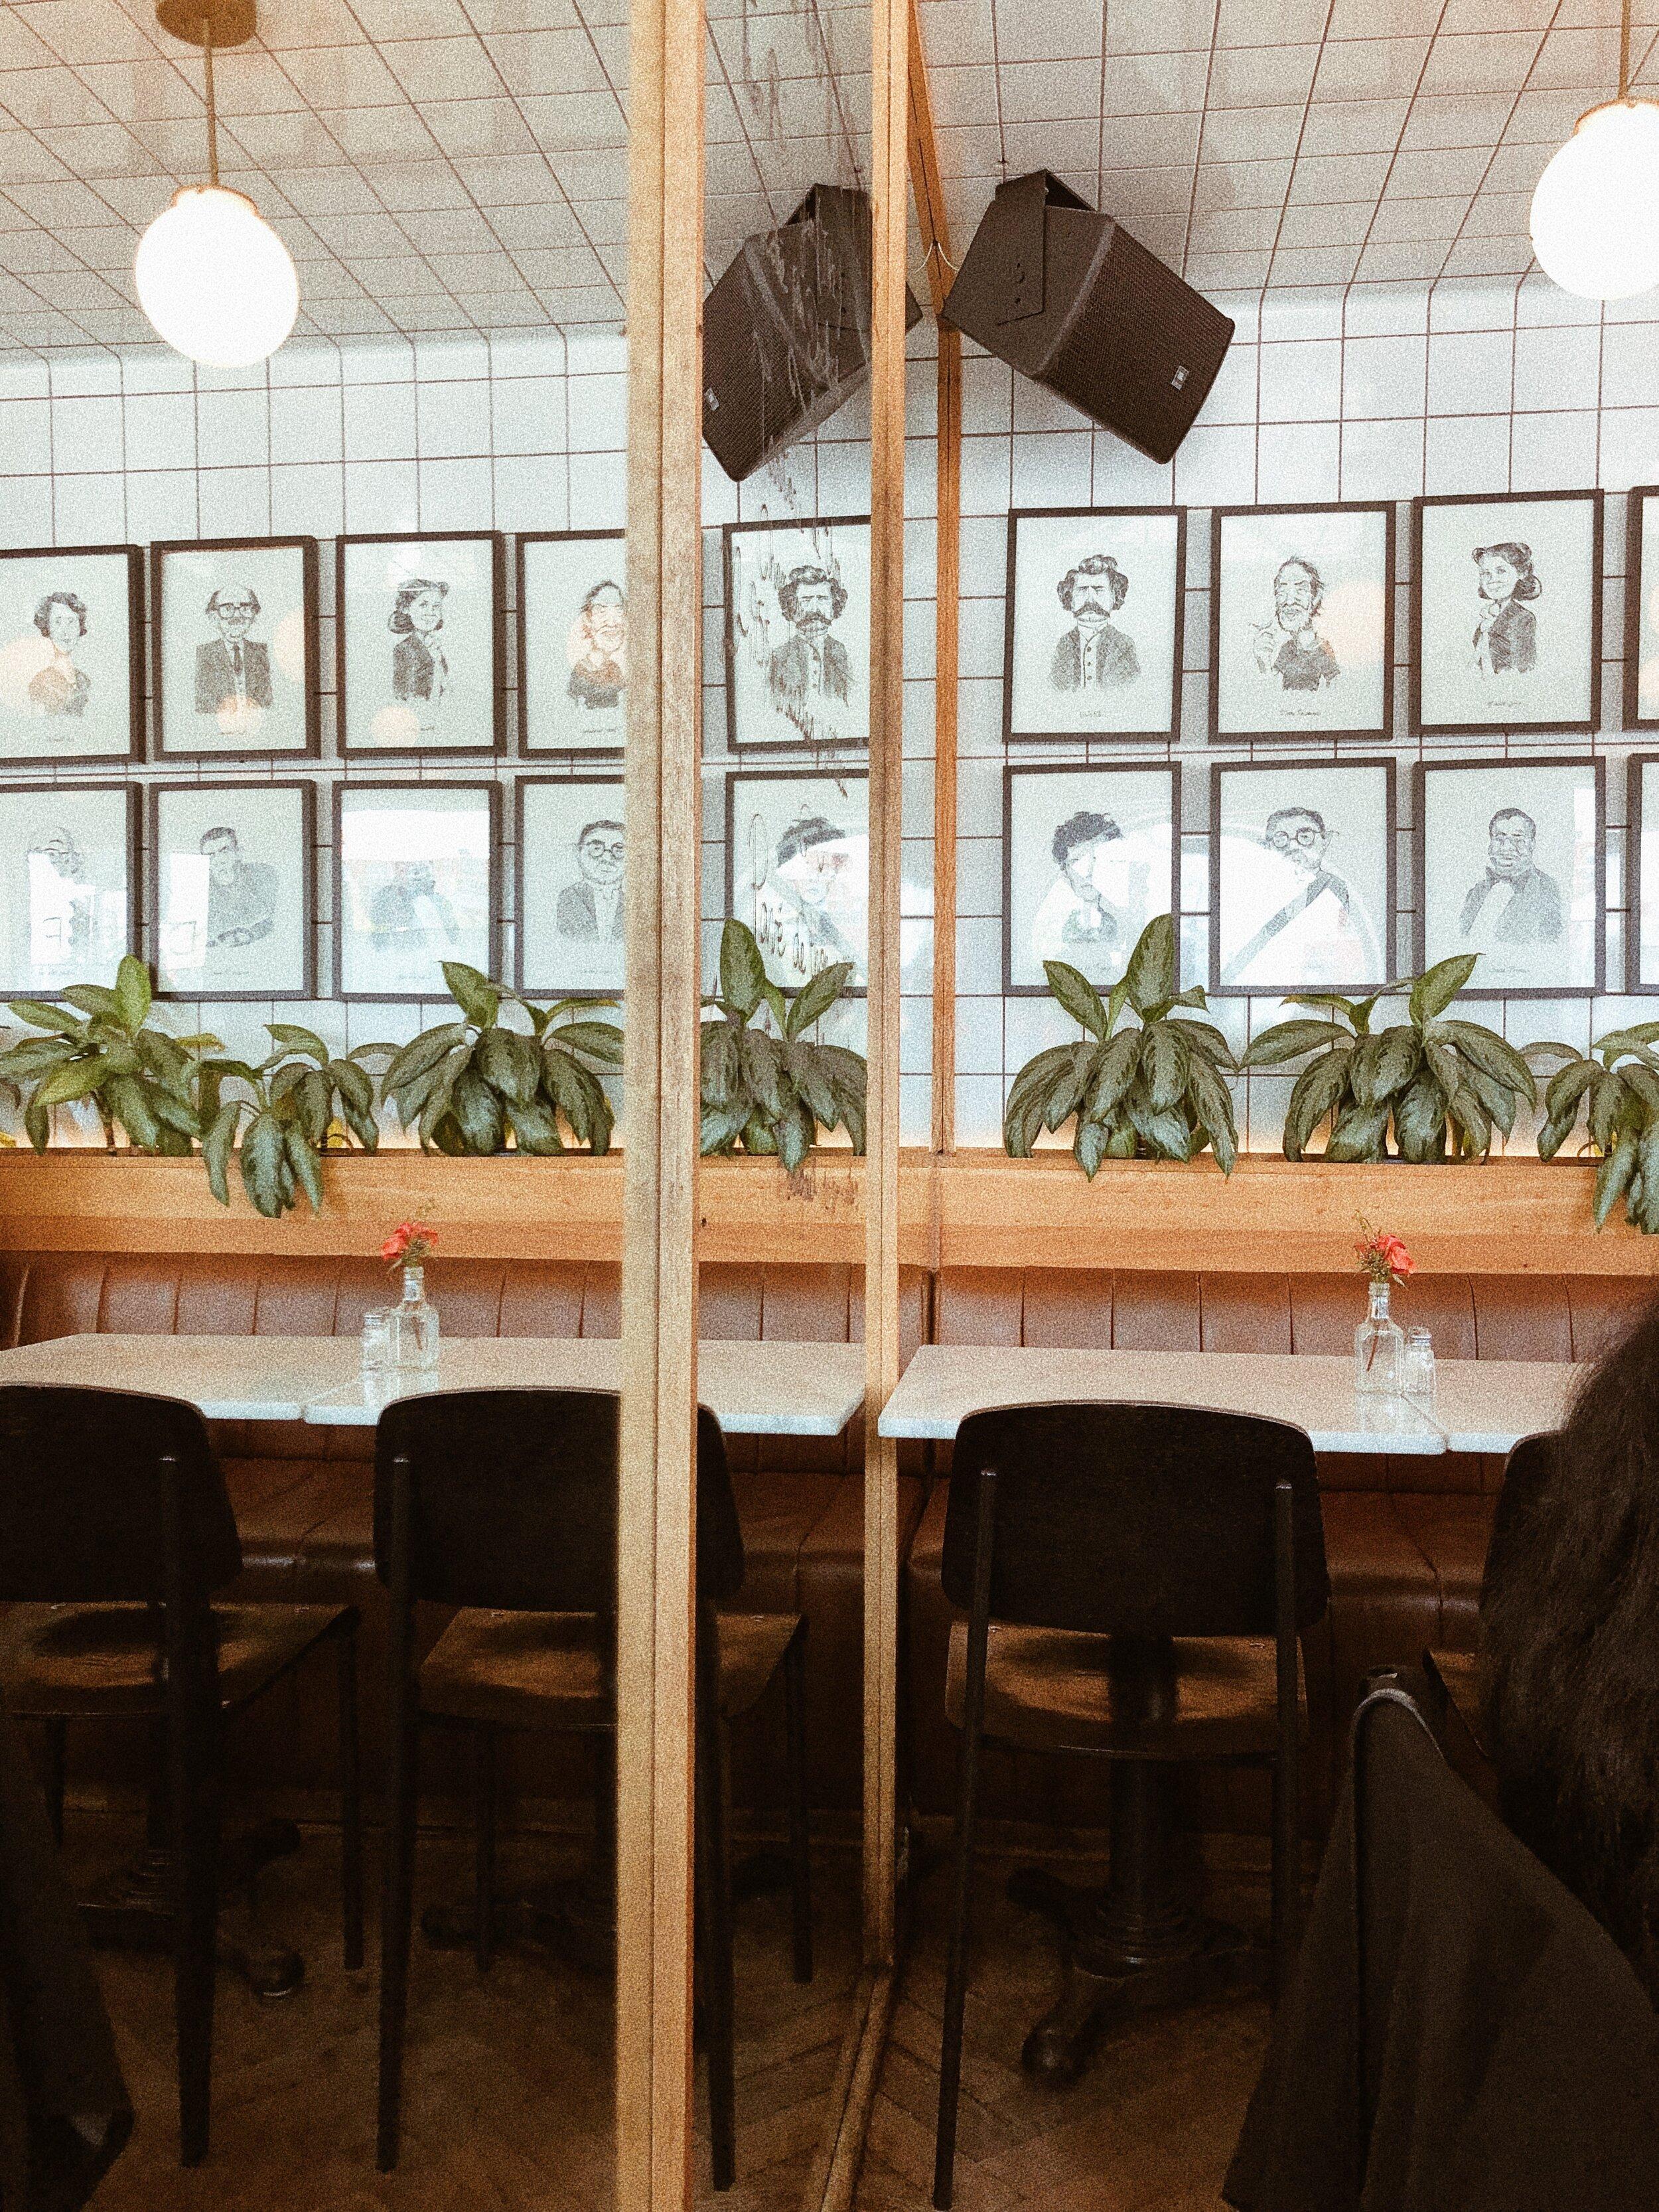 Foigwa french diner in montreal - katrina ramsvik phone photography ottawa canada